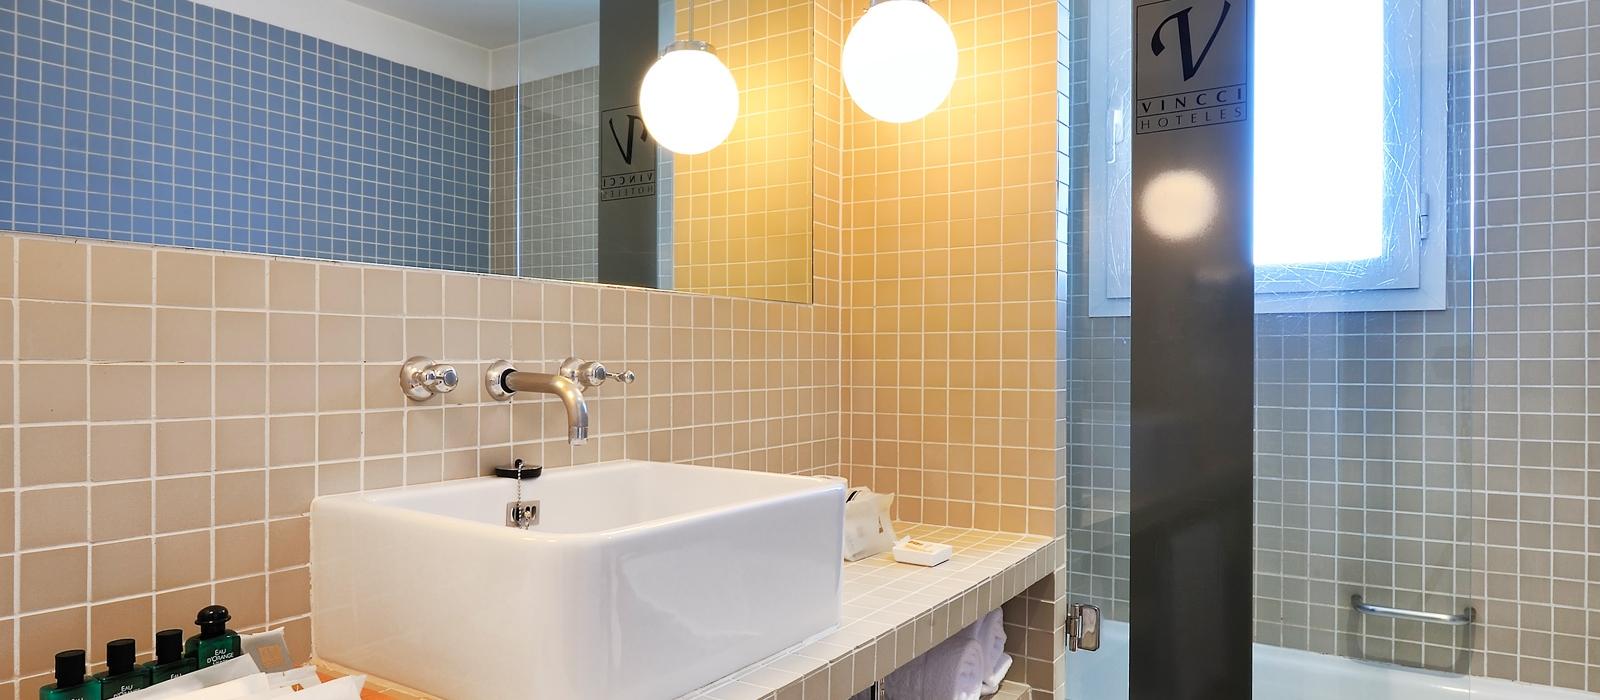 Rooms Hotel Soma Madrid - Vincci Hotels - Vincci Single Room